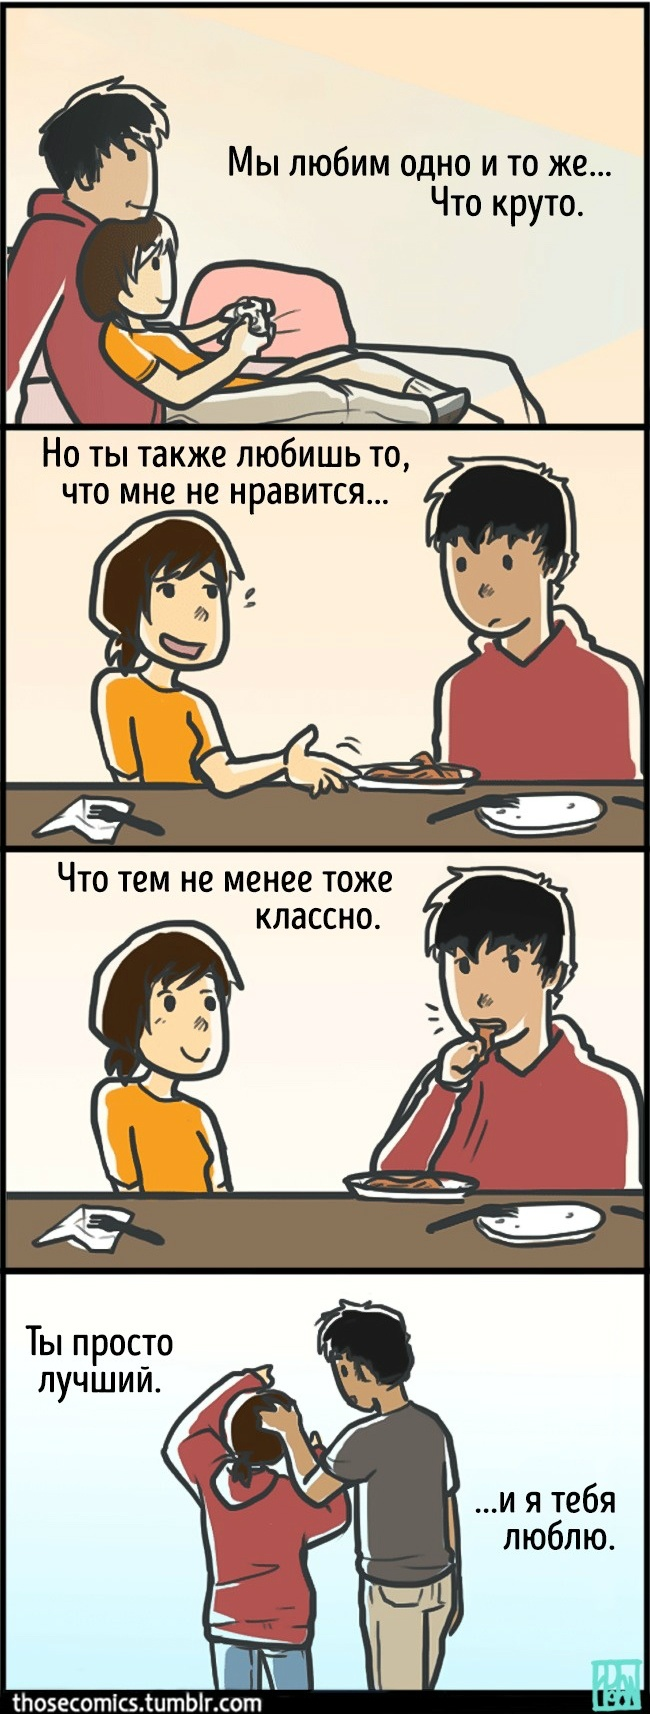 Источник: Those Comics Перевод: fotojoin.ru